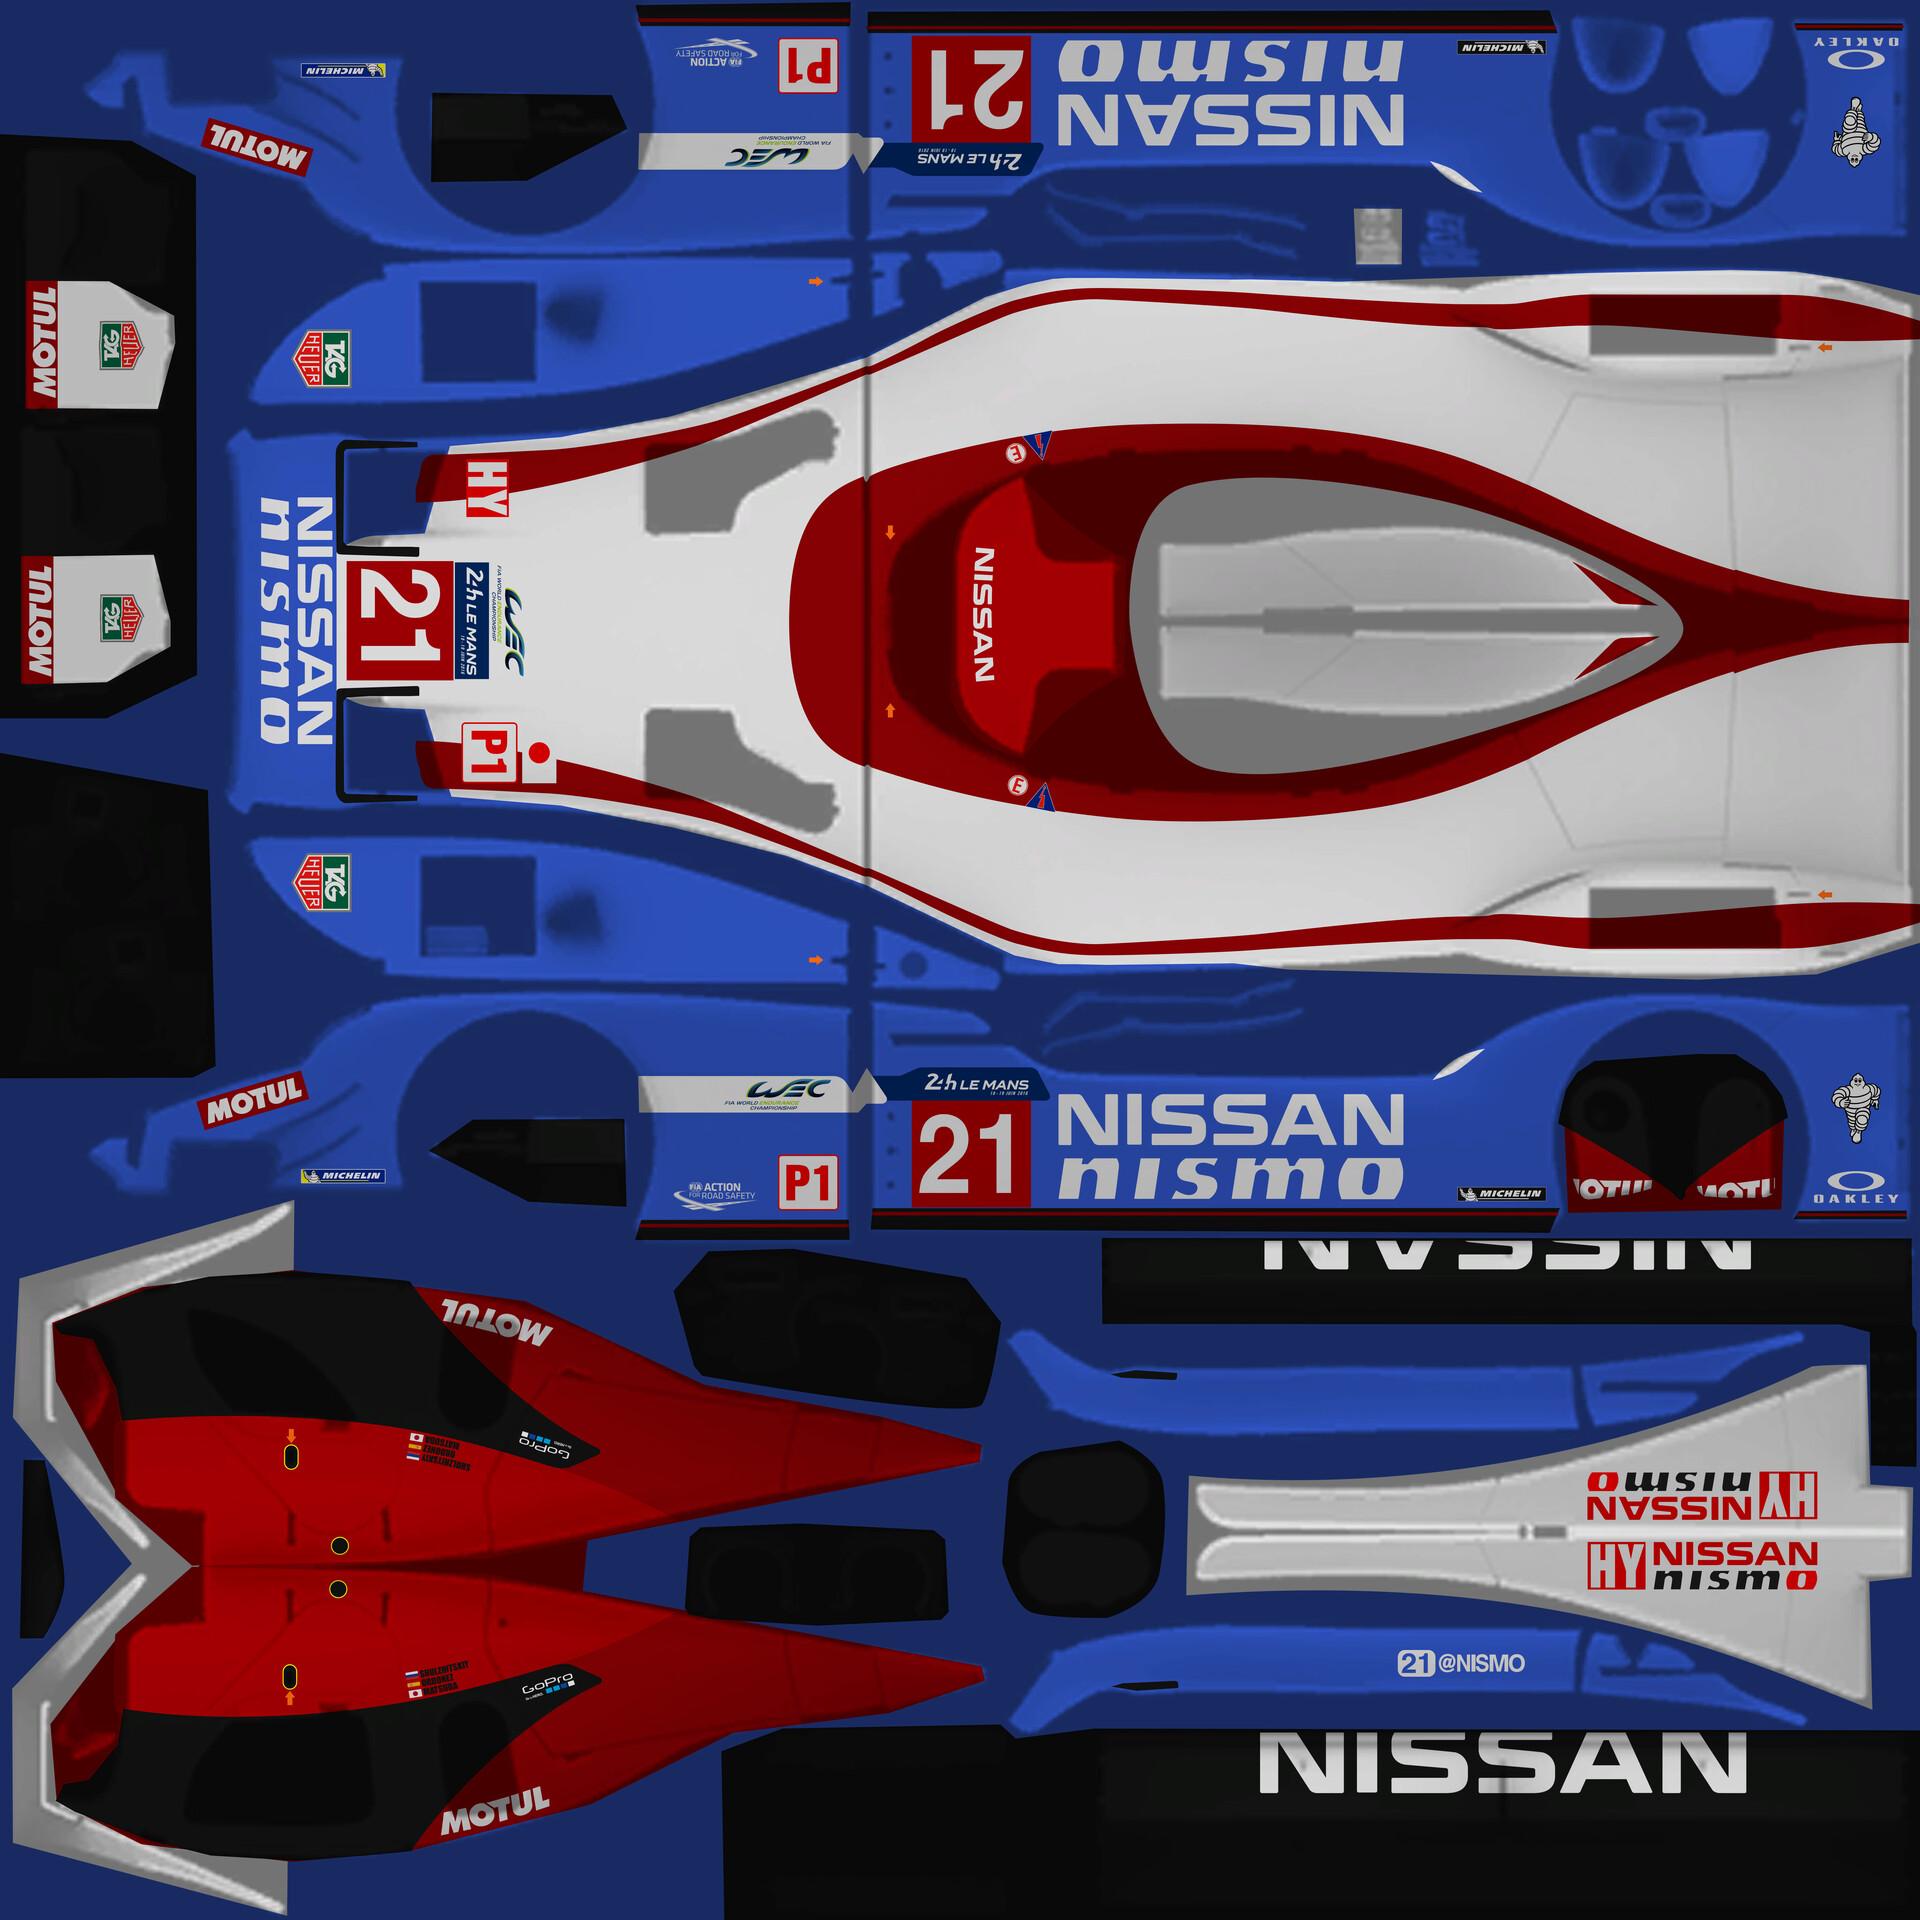 ArtStation - Nissan GT-R LM Nismo 2015 #21, Ugo Degani